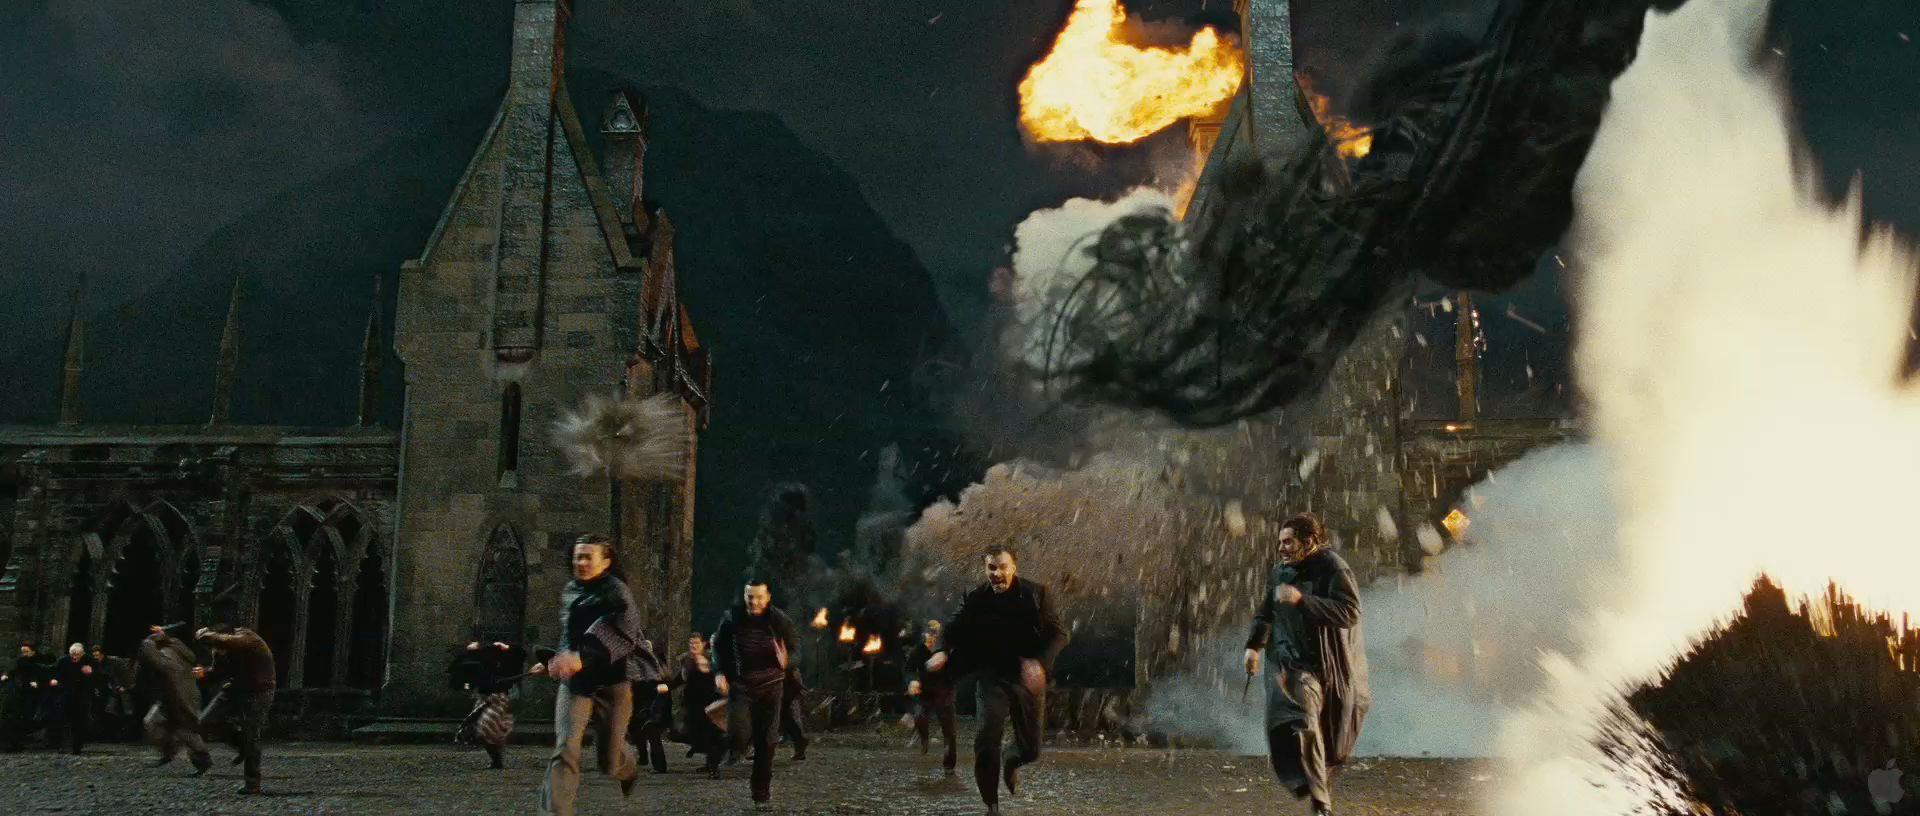 Harry Potter BlogHogwarts HP7 2 Trailer 38